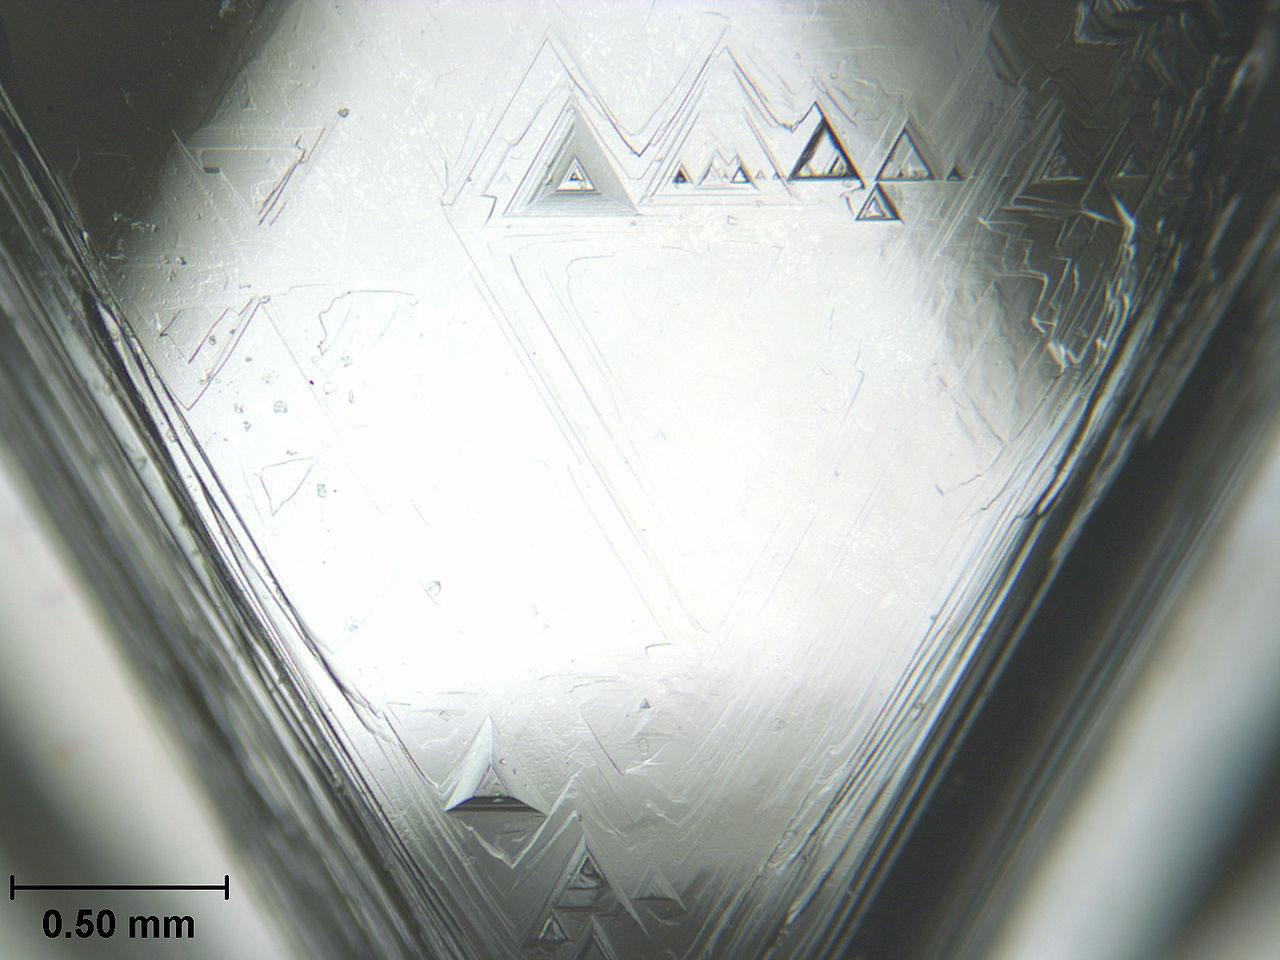 1280px-Diamond_face_trigons_scale.jpg